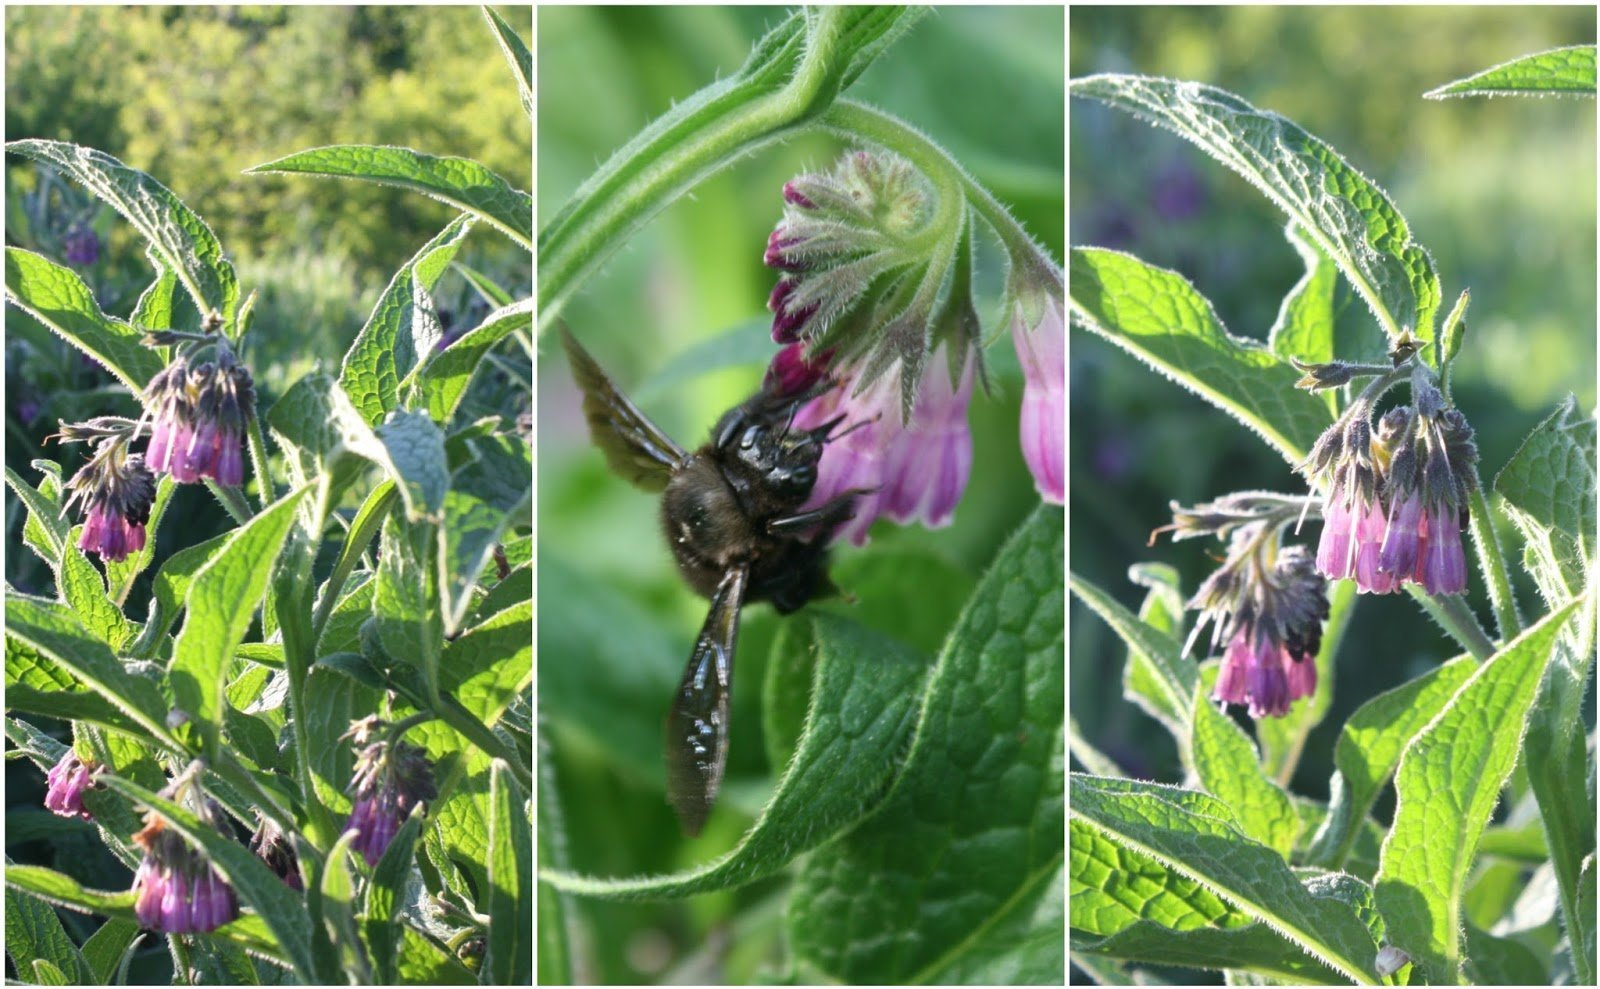 Permaculture Plant- Comfrey - Symphytum x uplandicum 'Bocking 14'.